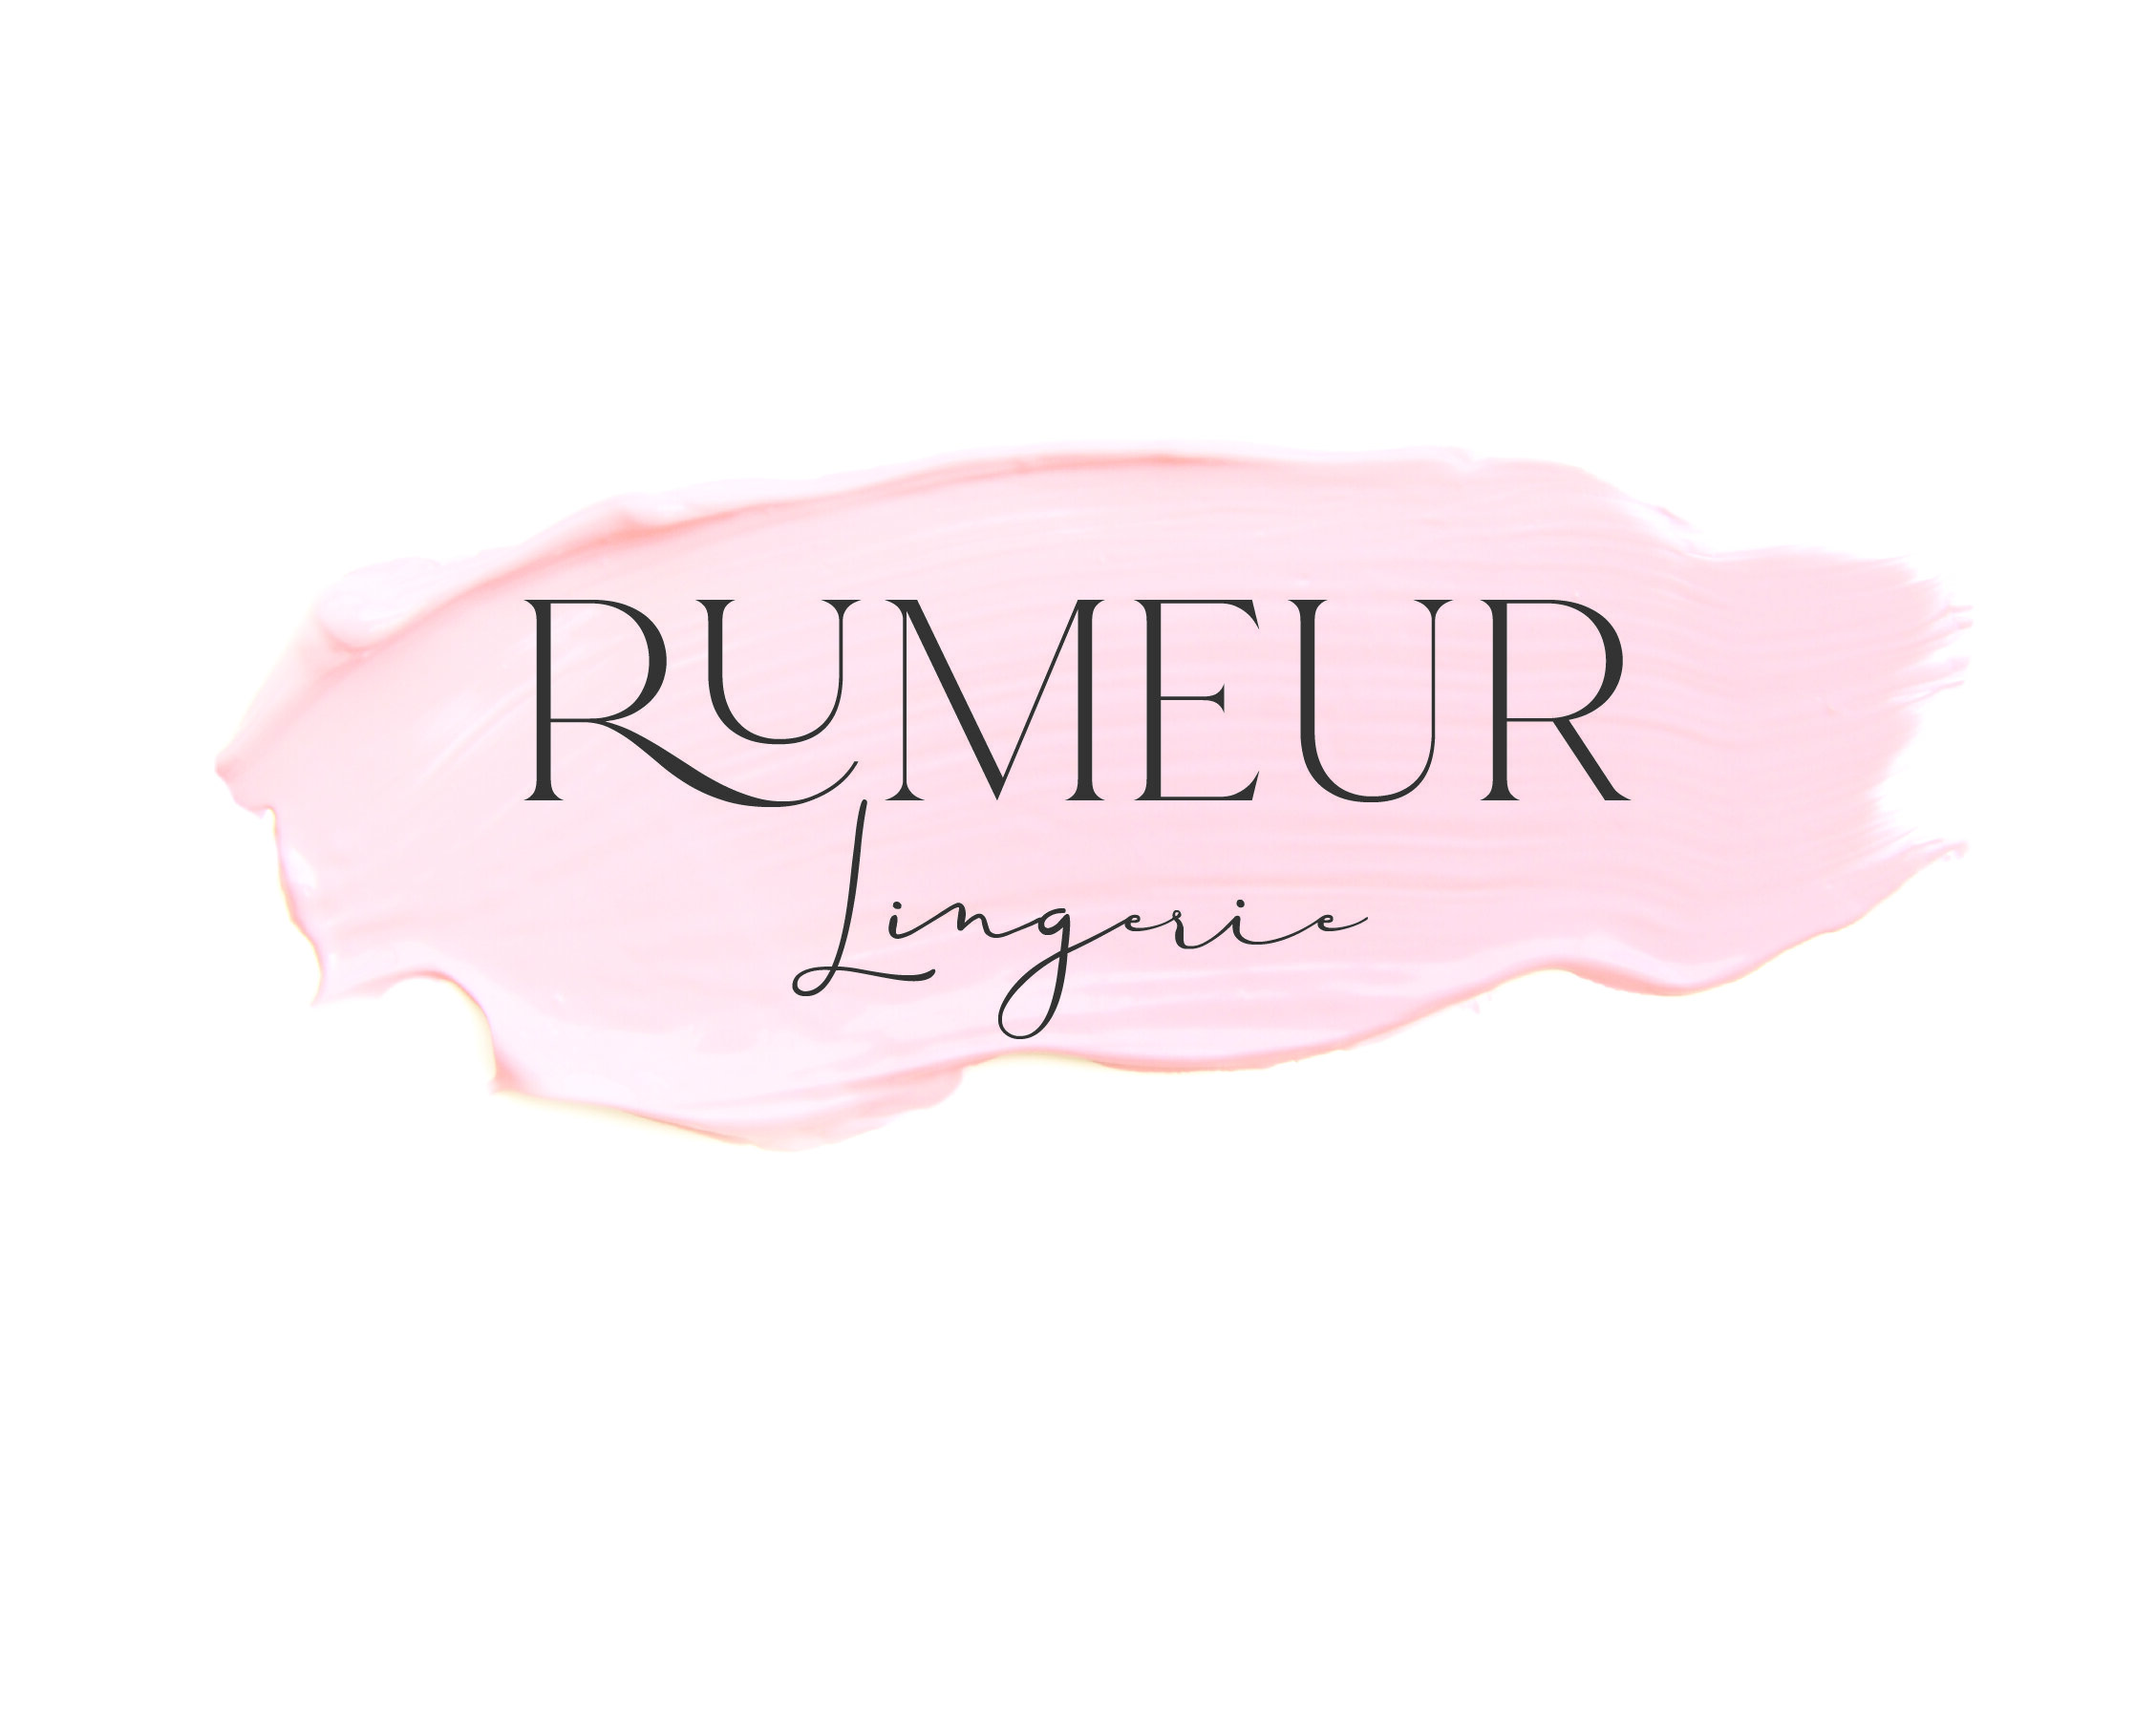 Rumeur logo_background.jpg